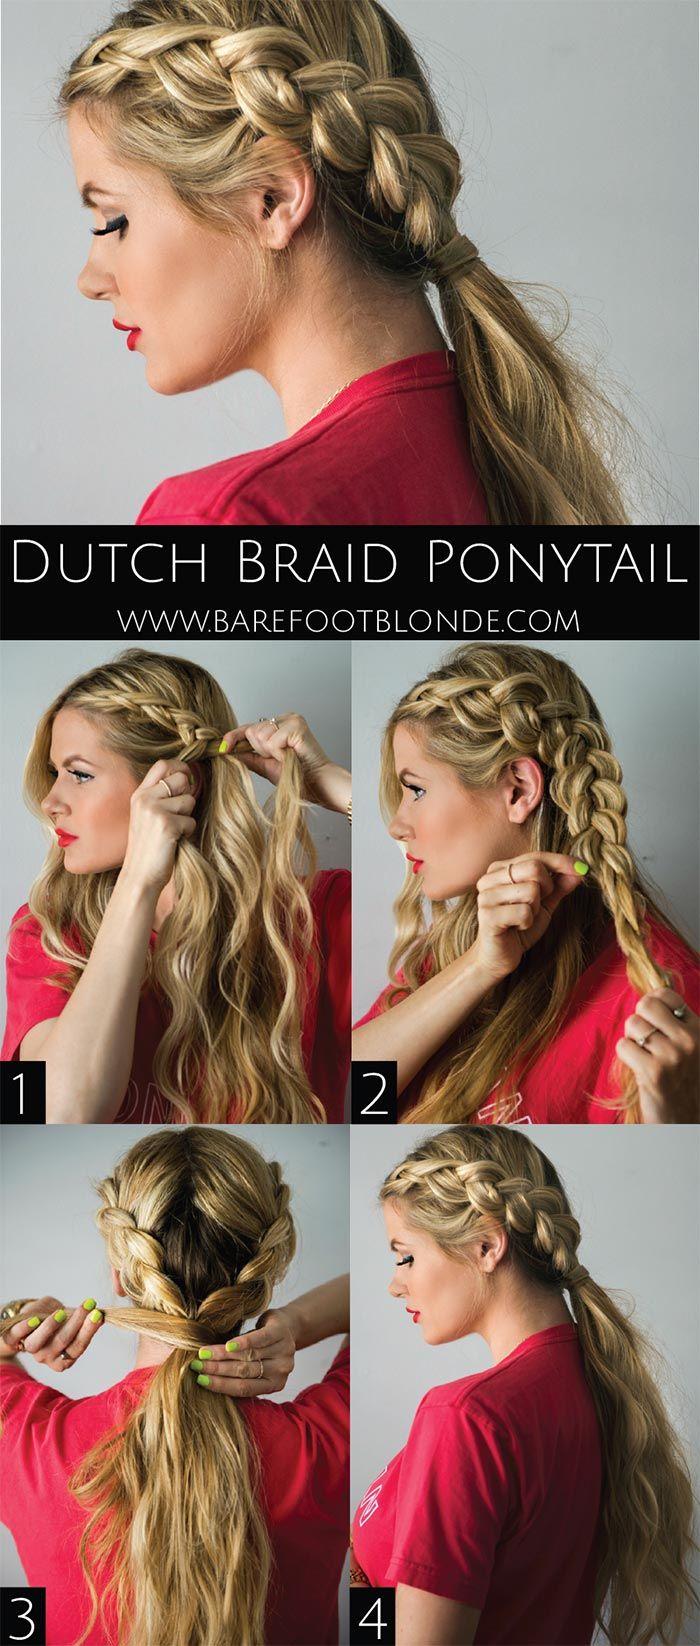 penteados com tranças hair style makeup and braid hairstyles